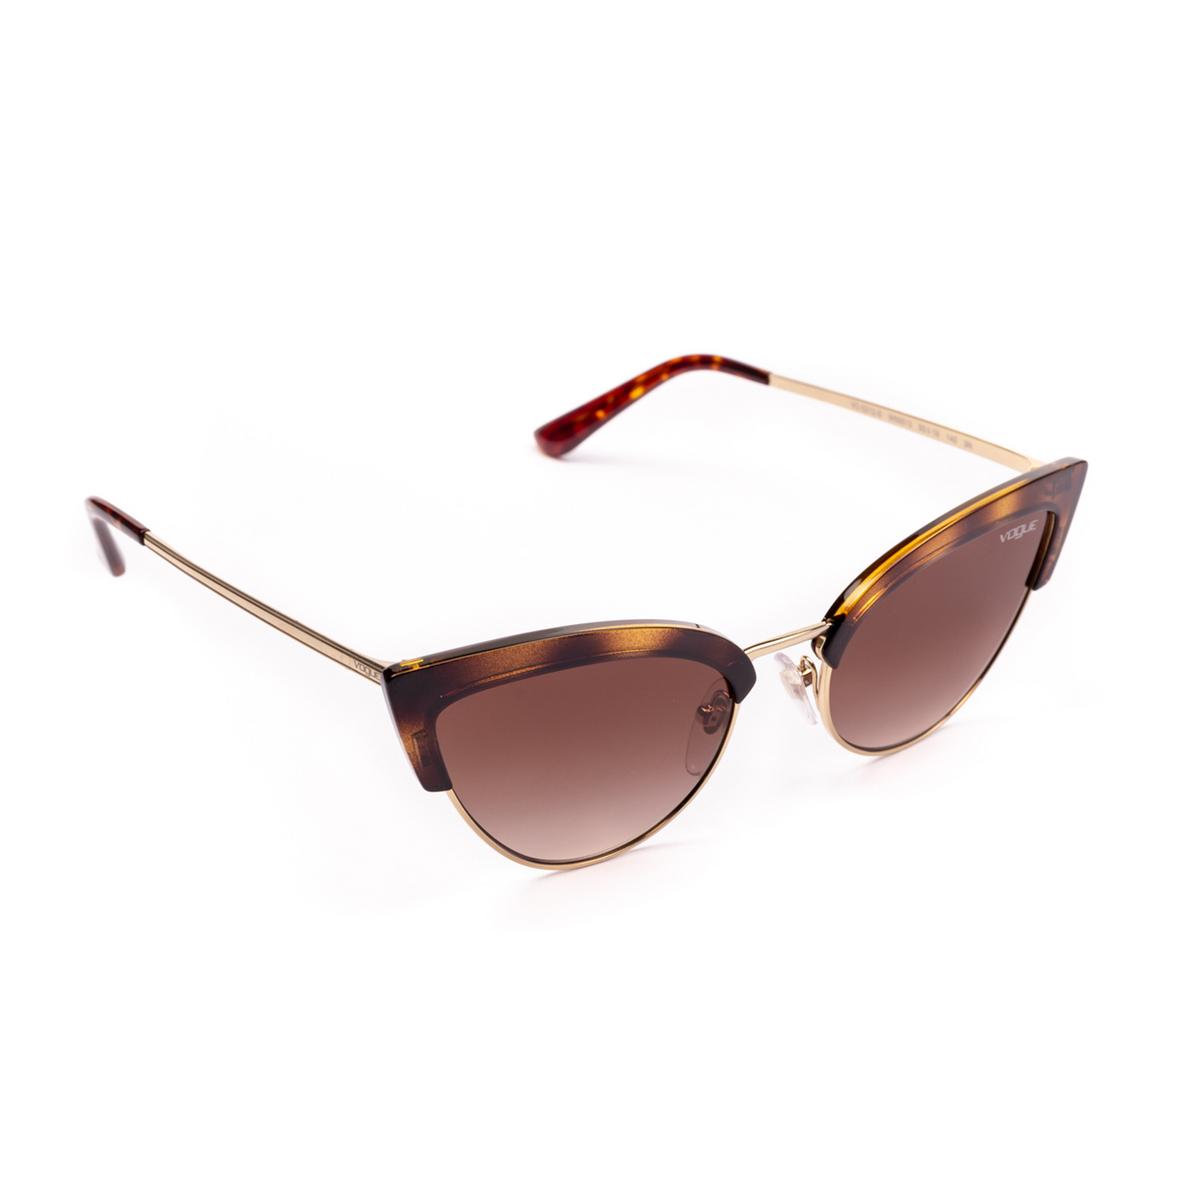 Vogue® Cat-eye Sunglasses: VO5212S color Top Dark Havana / Pale Gold W65613 - three-quarters view.